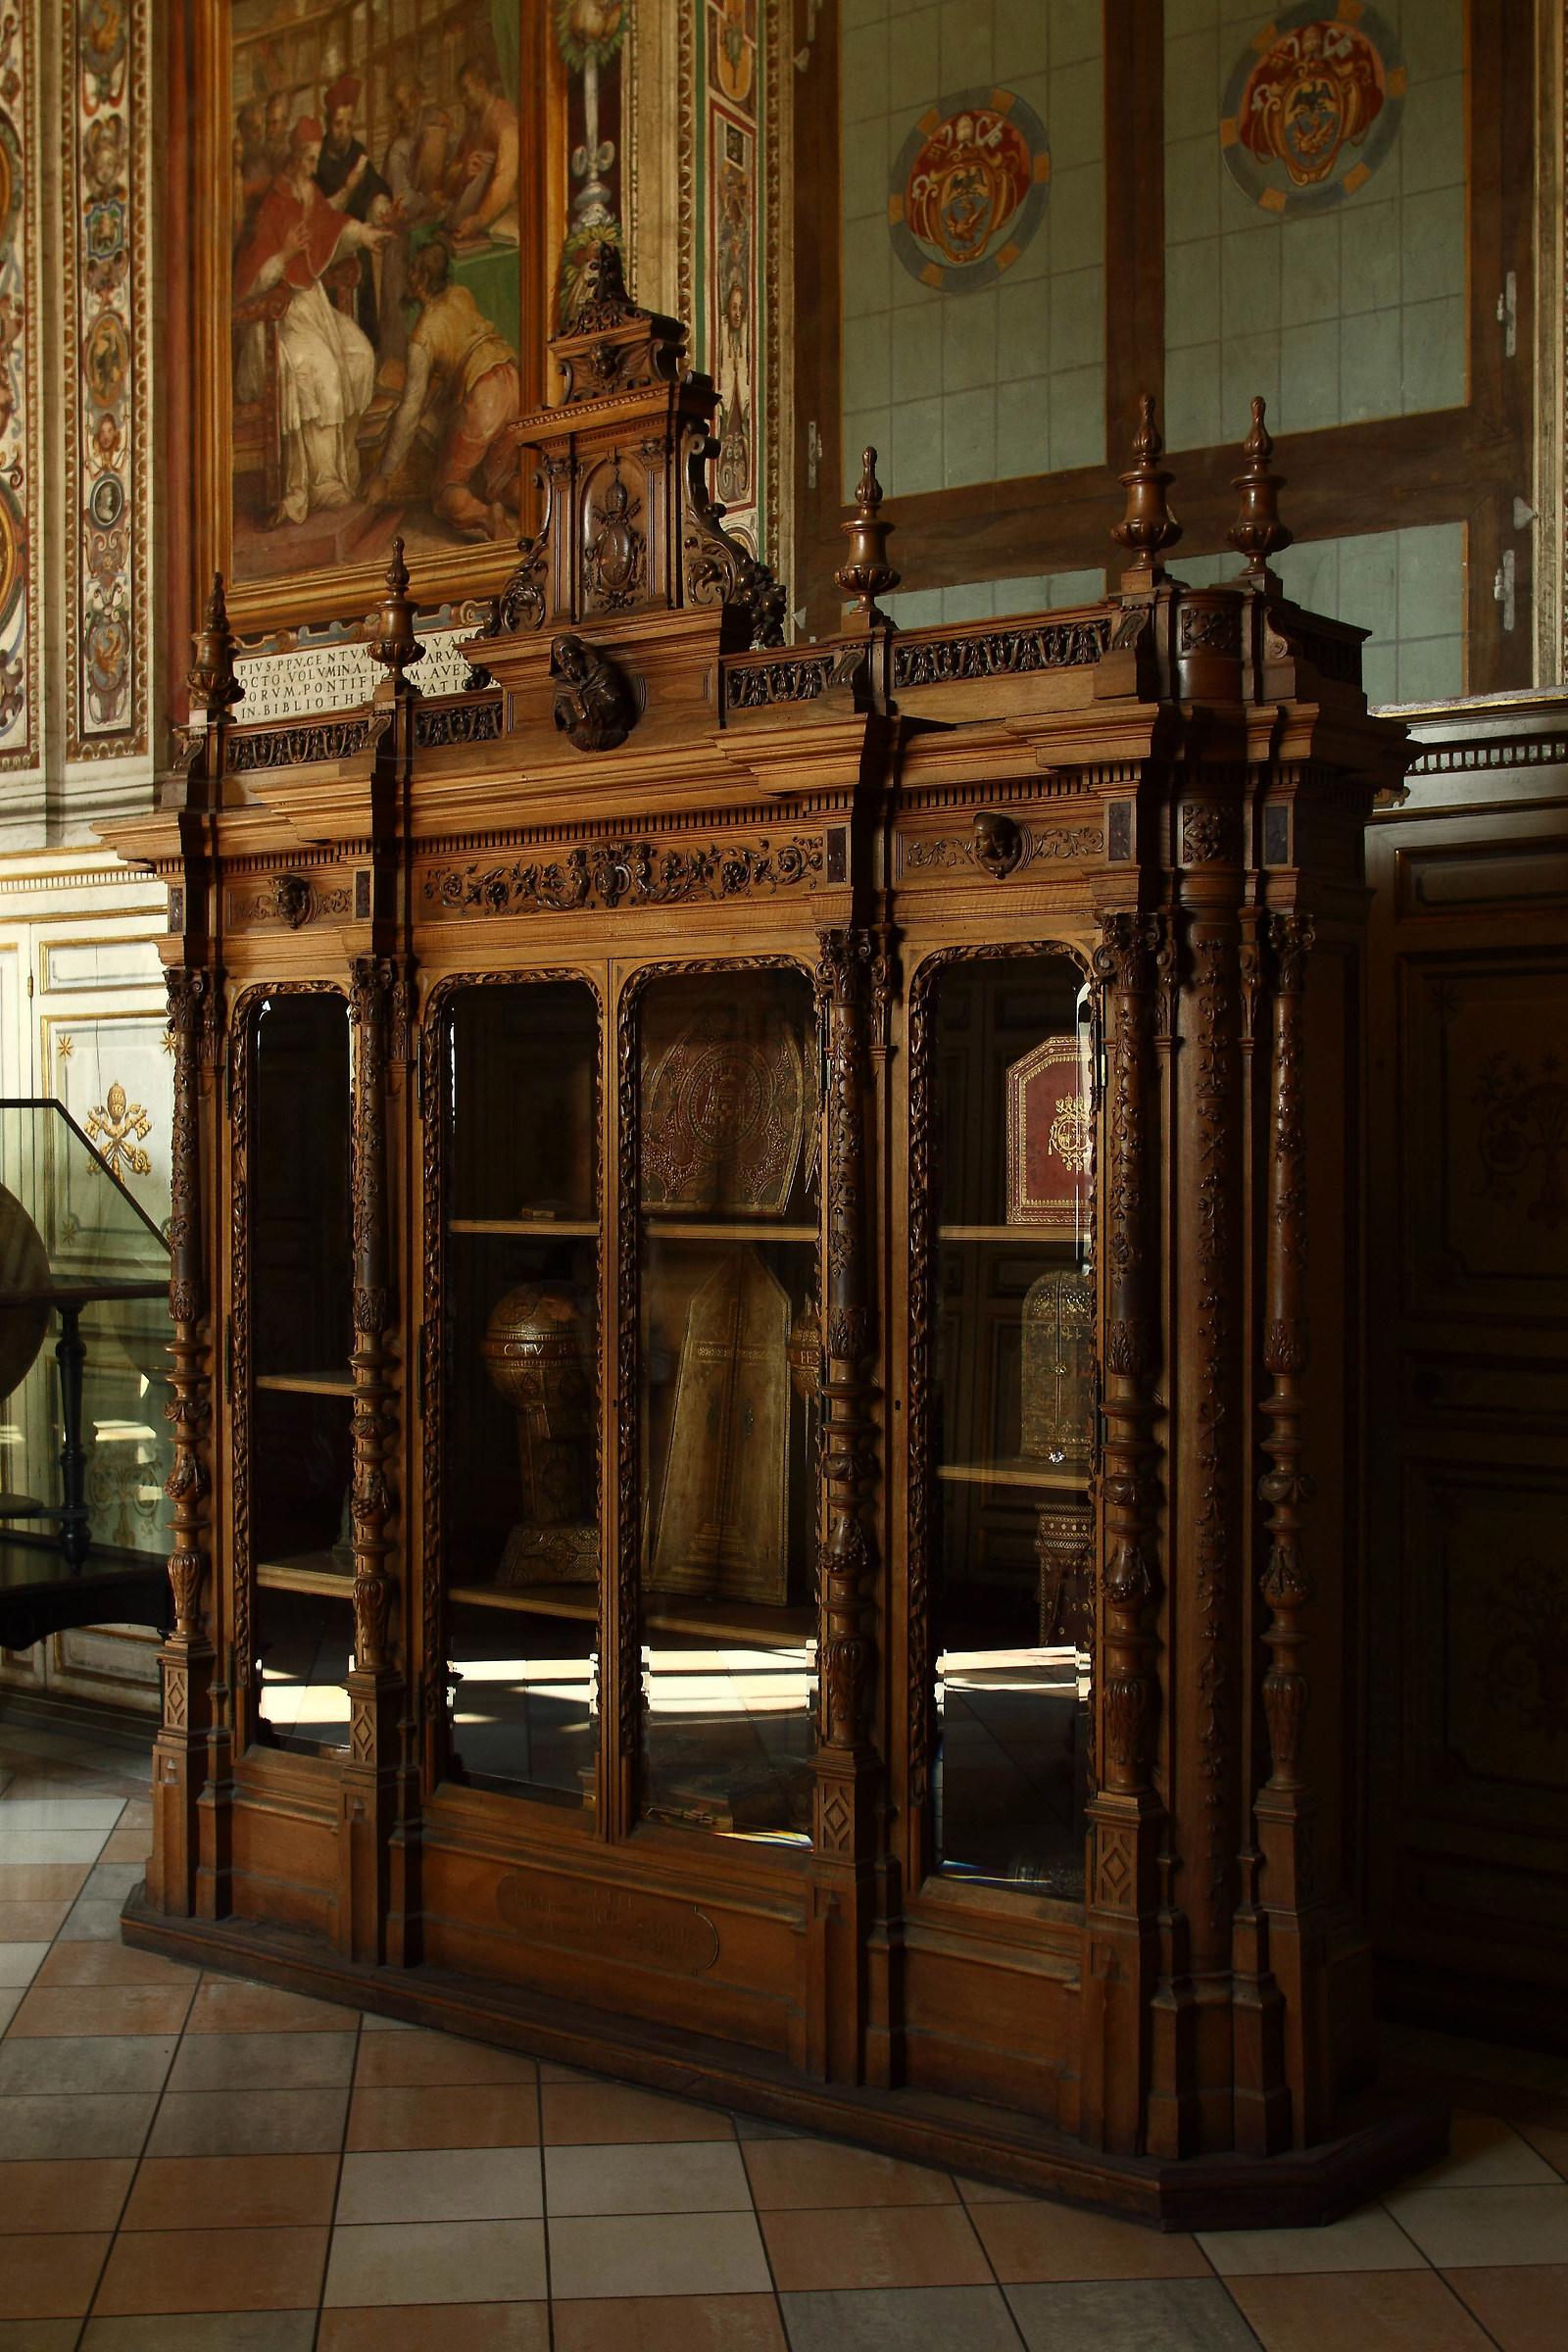 inside the Vatican Museums...